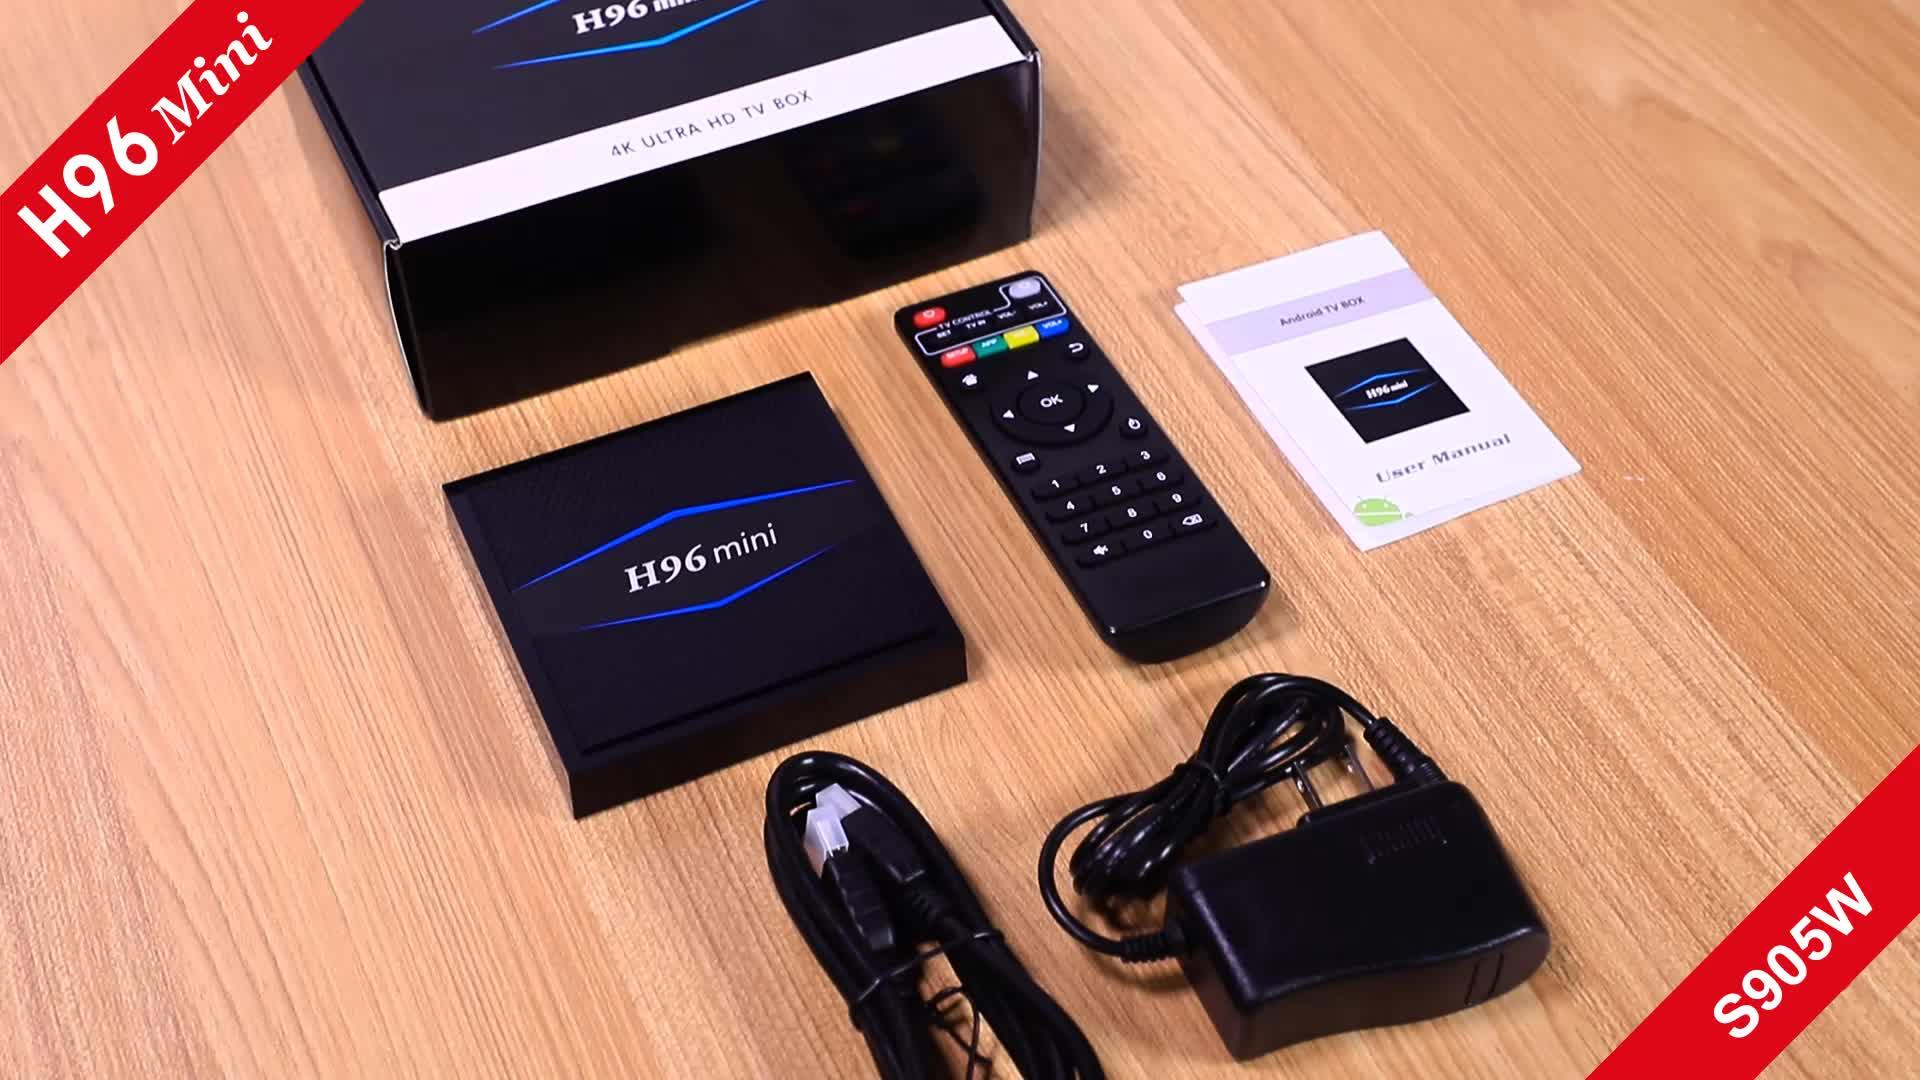 Nuovo arrivo 2018 media player H96 mini 2 gb/16 gb dual wifi BT4.0 amlogic s905w android tv box h96mini